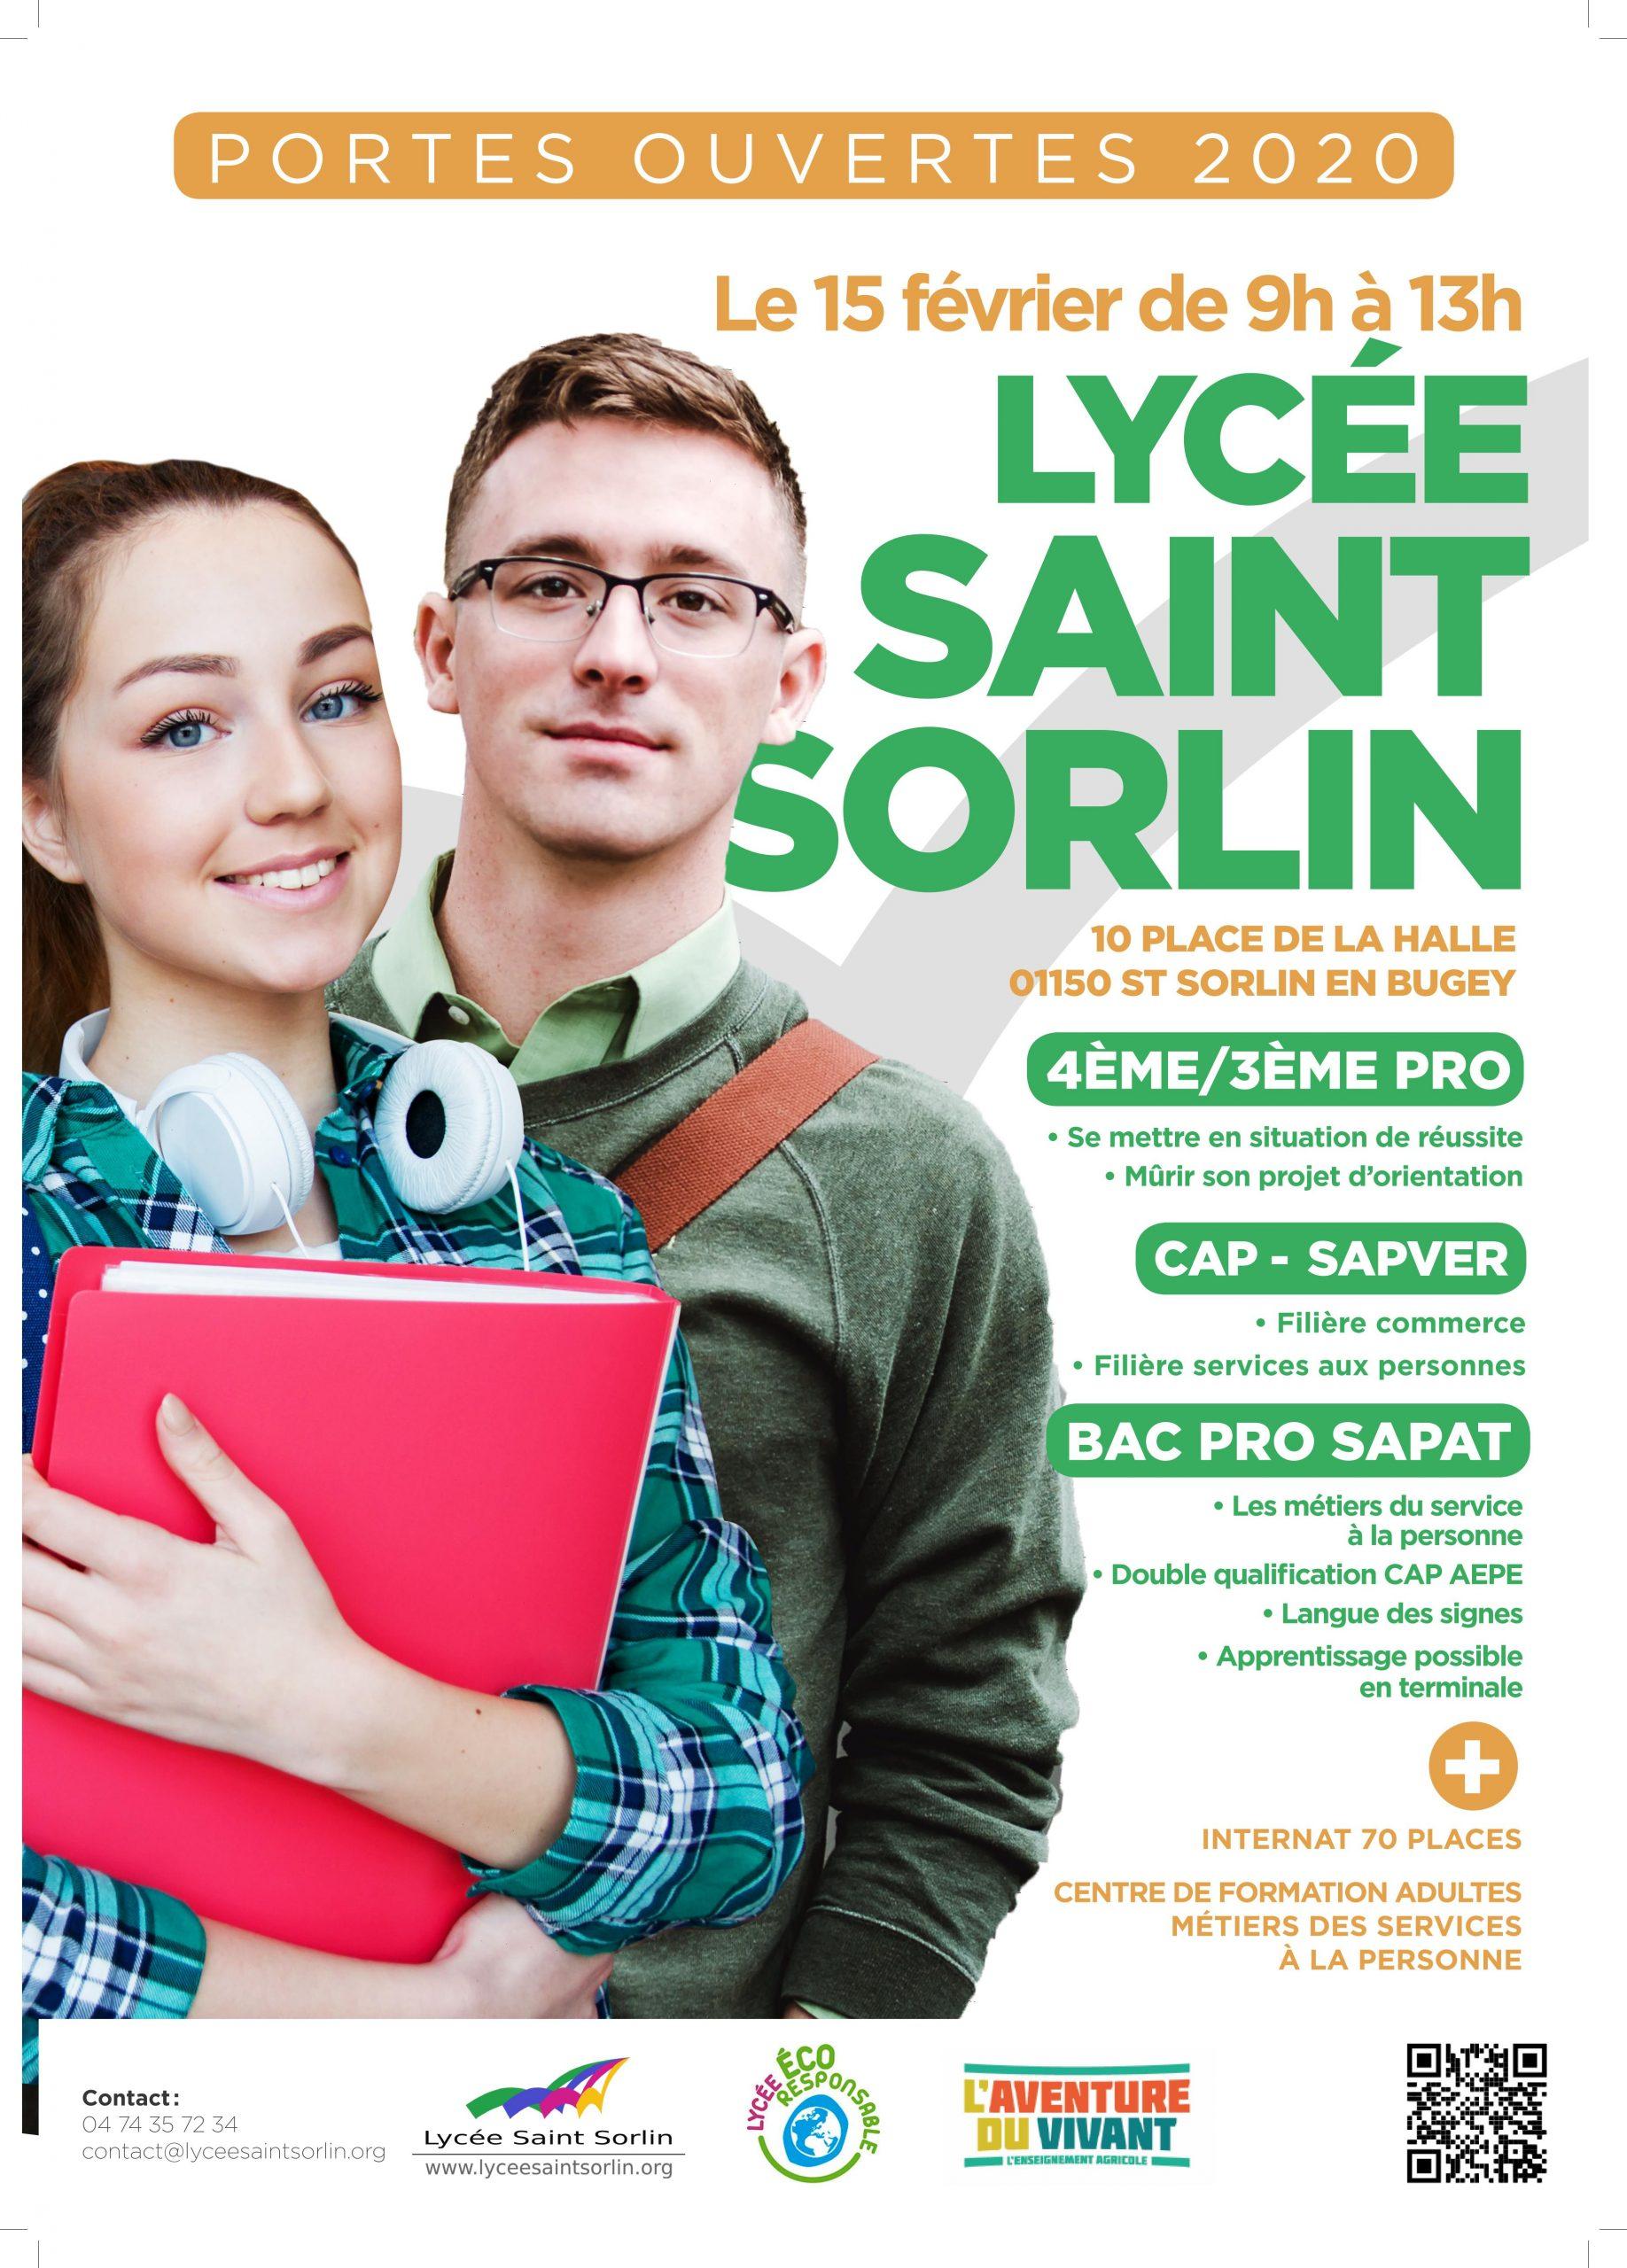 Saint_sorlin_lycee_affiches_22-01-DEF_01